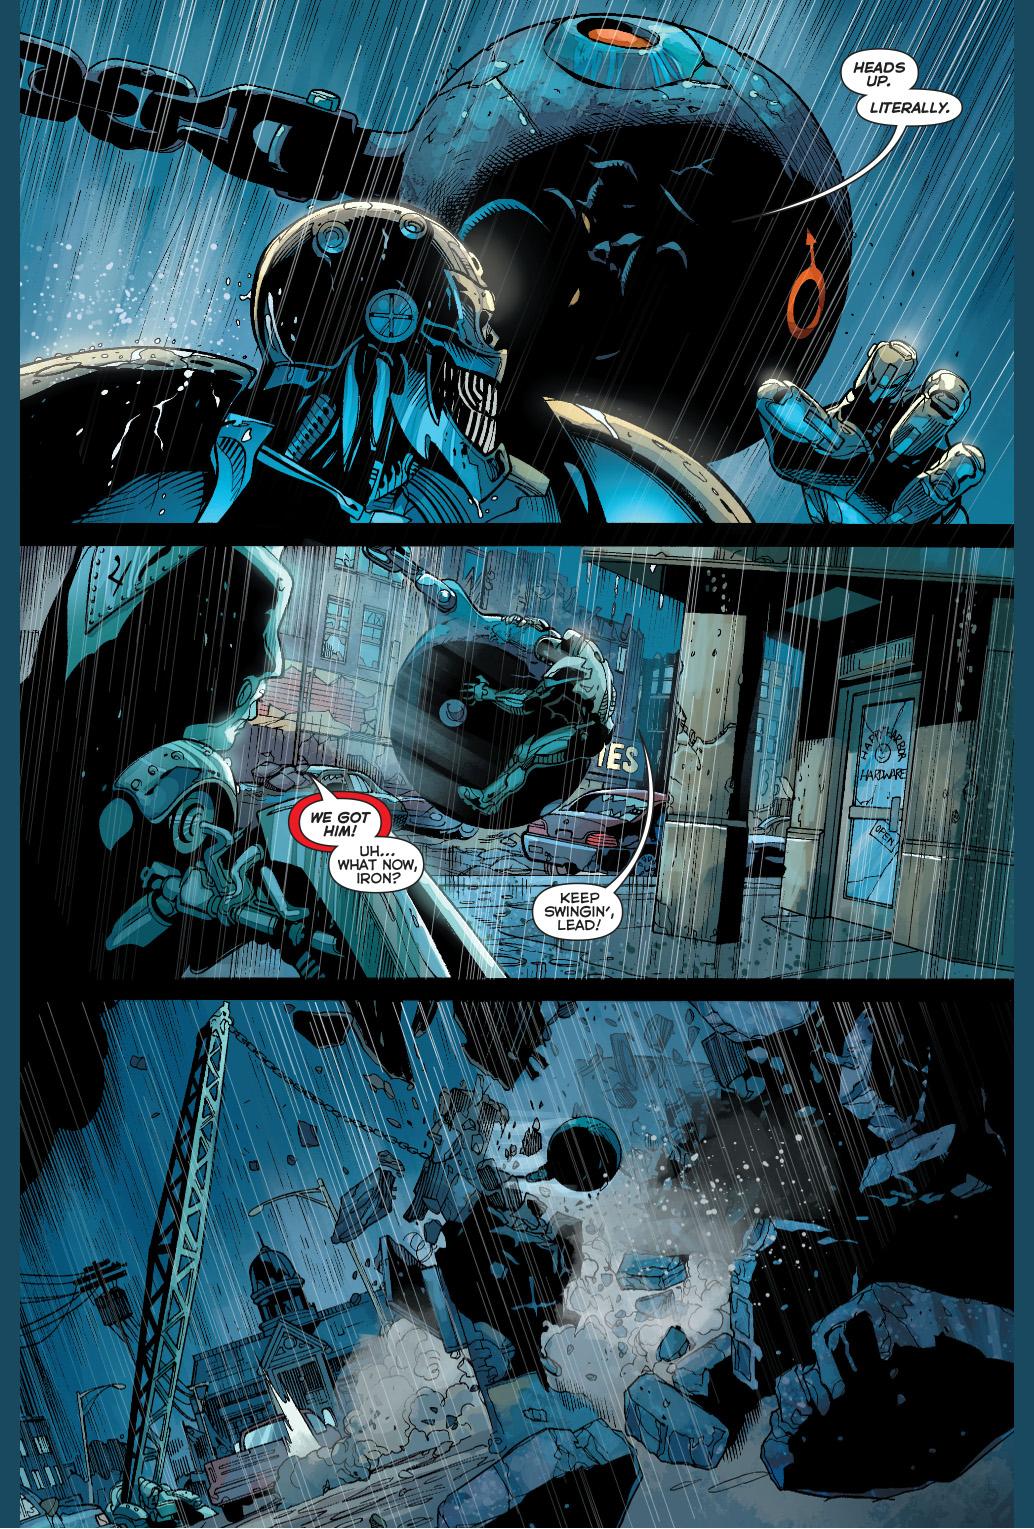 cyborg and the metal men vs grid